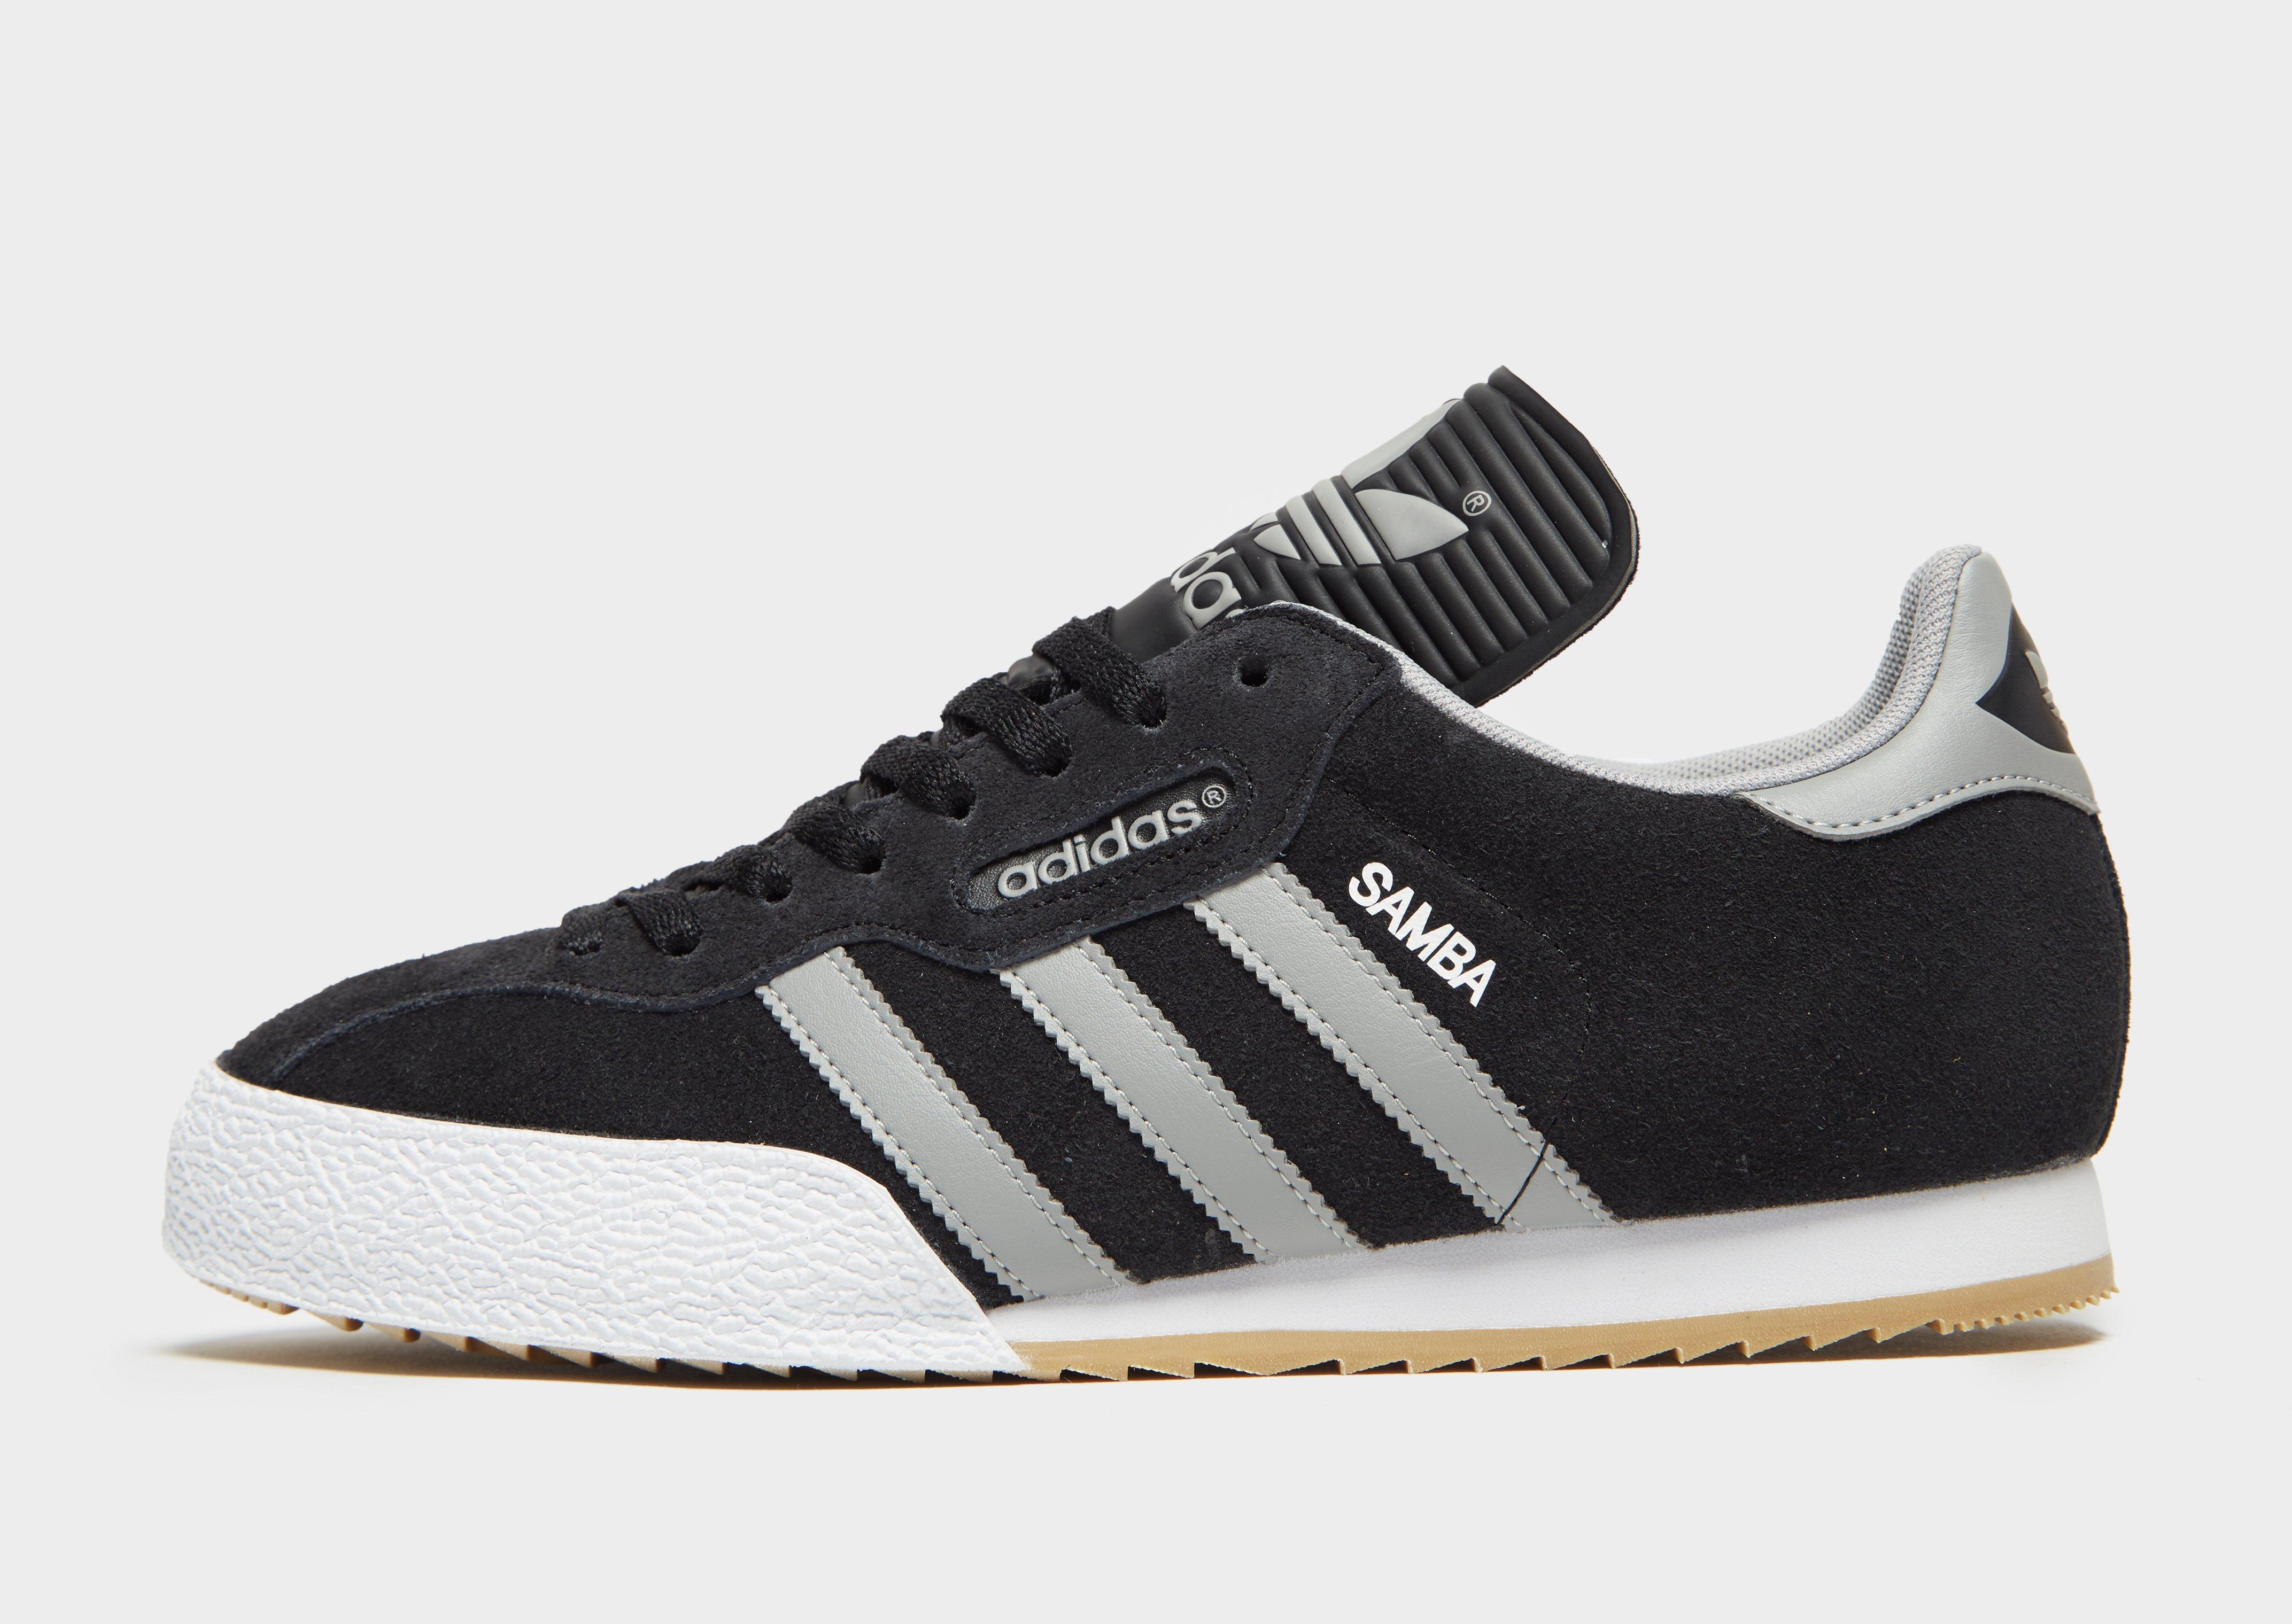 Compra adidas Originals Samba Super | JD Sports